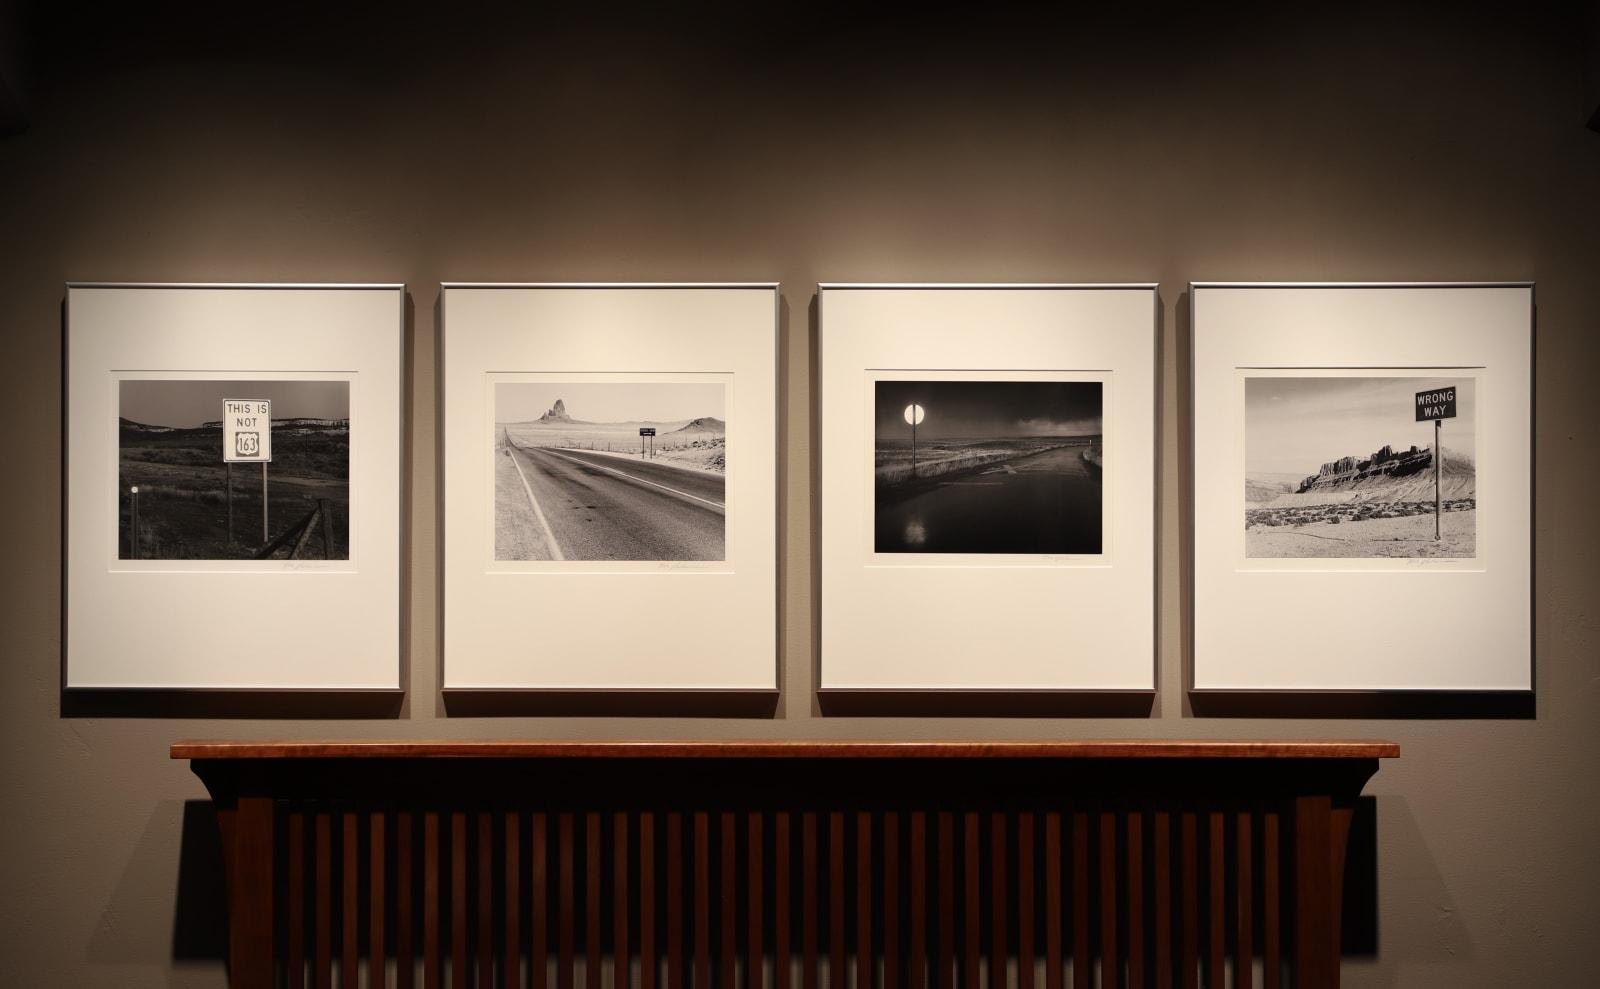 Bob Kolbrener: Roadsigns